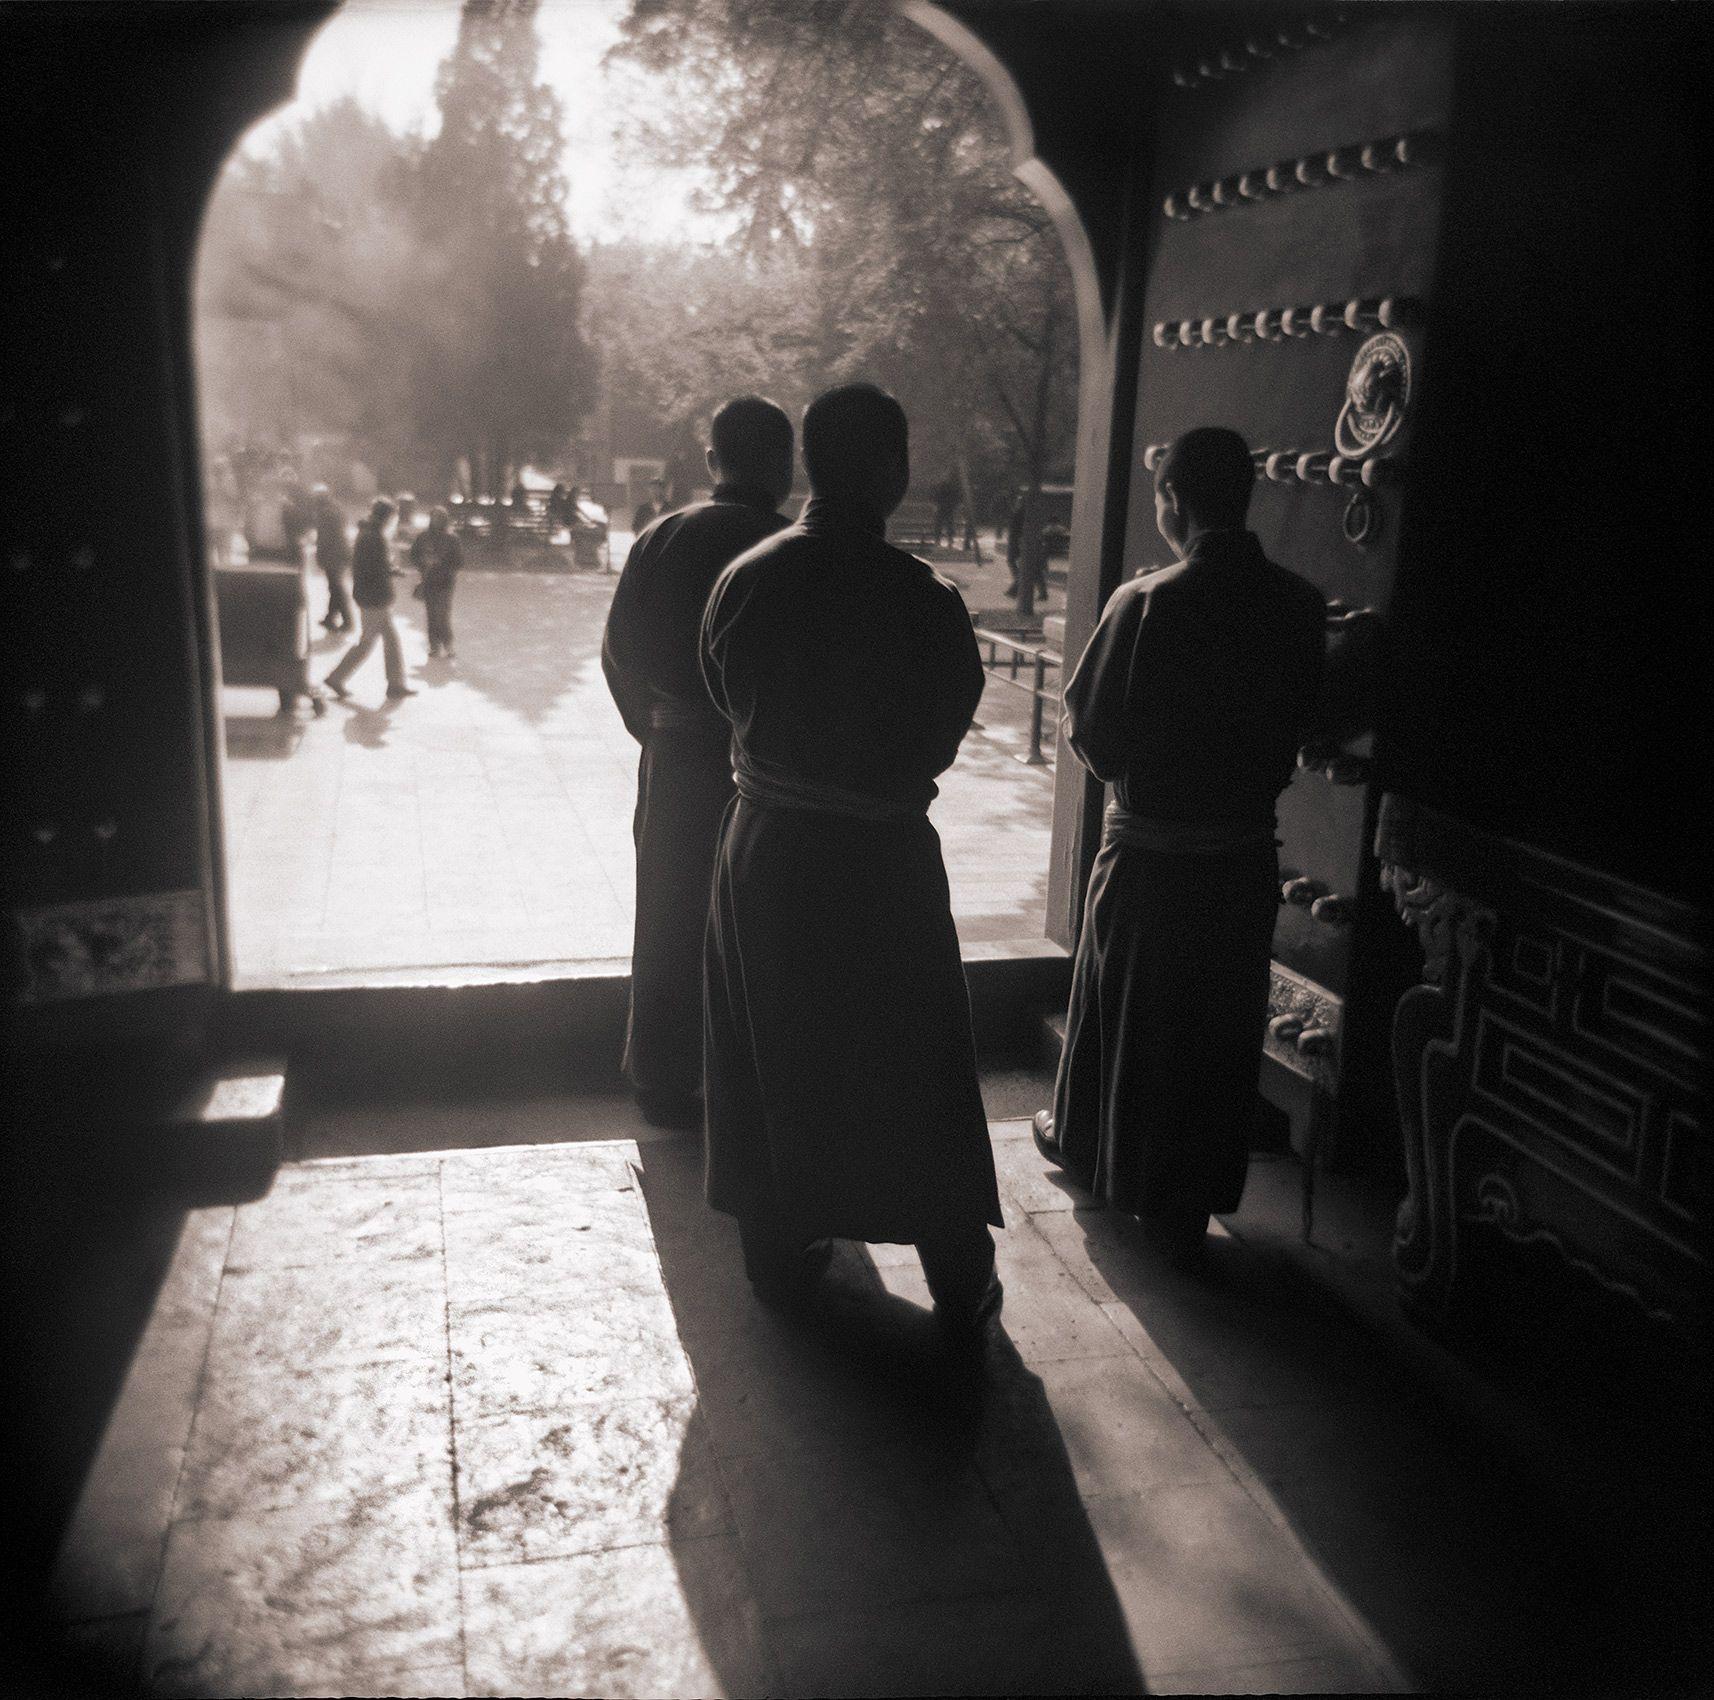 Llama Temple Monks